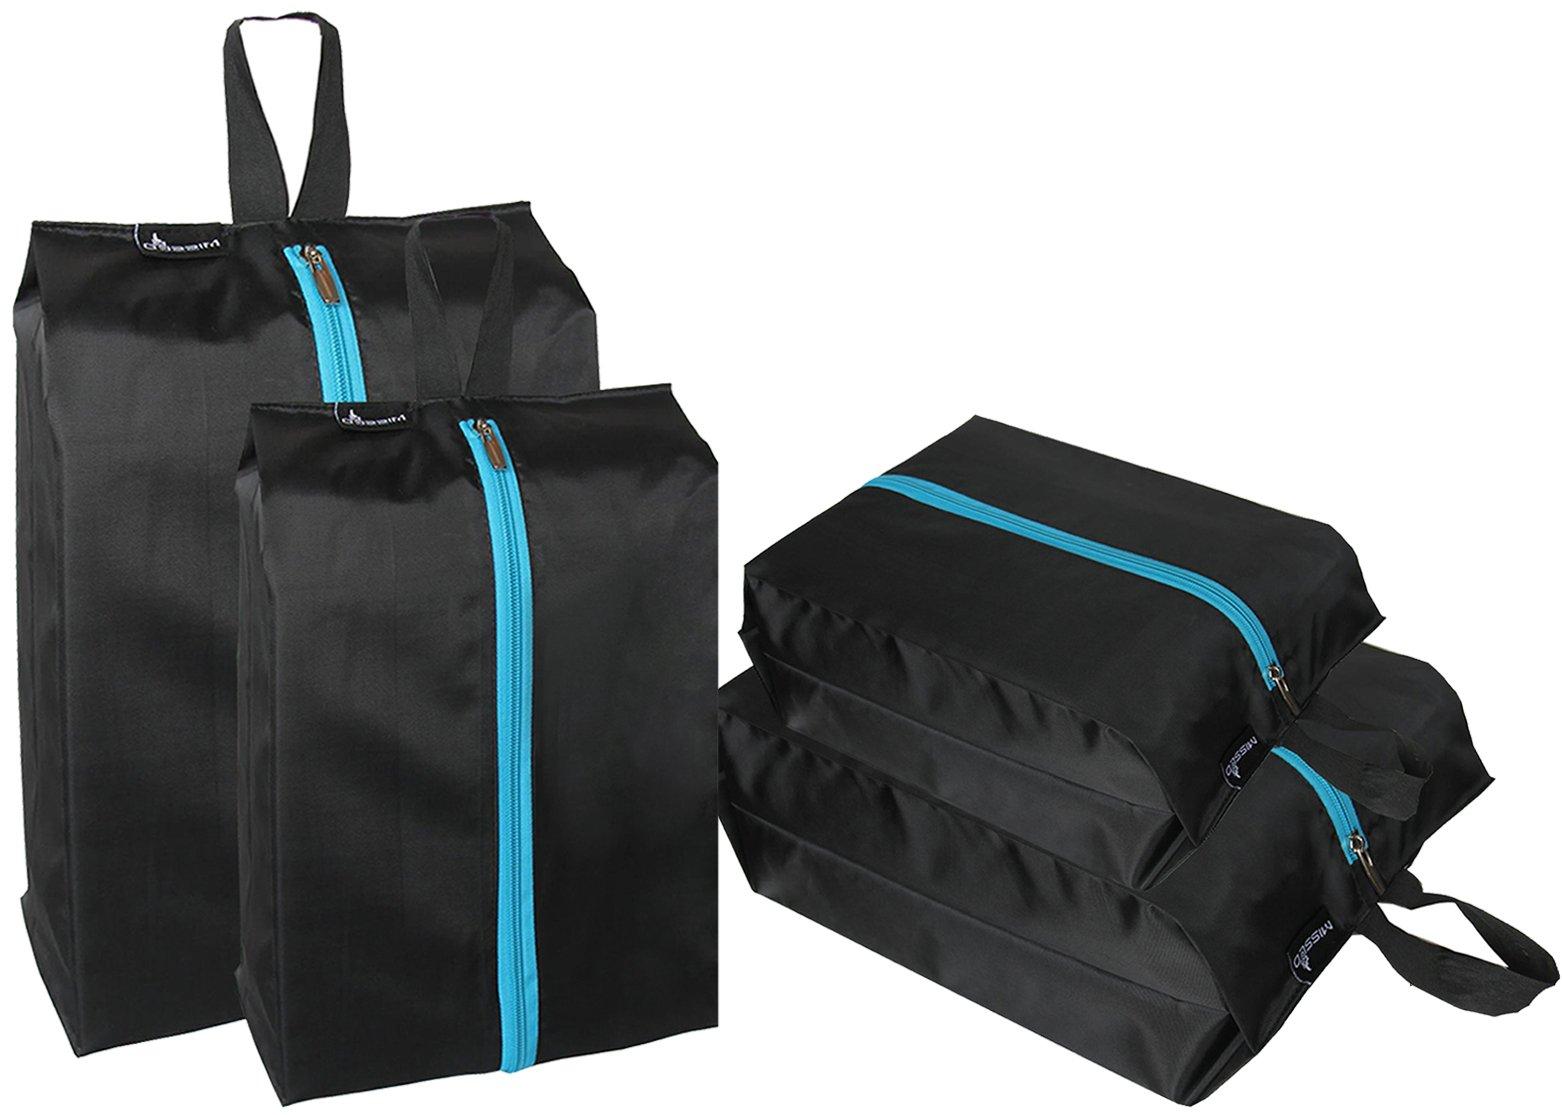 MISSLO Waterproof Zippered Travel Shoe Bags for Men & Women (4 Pack, Black)